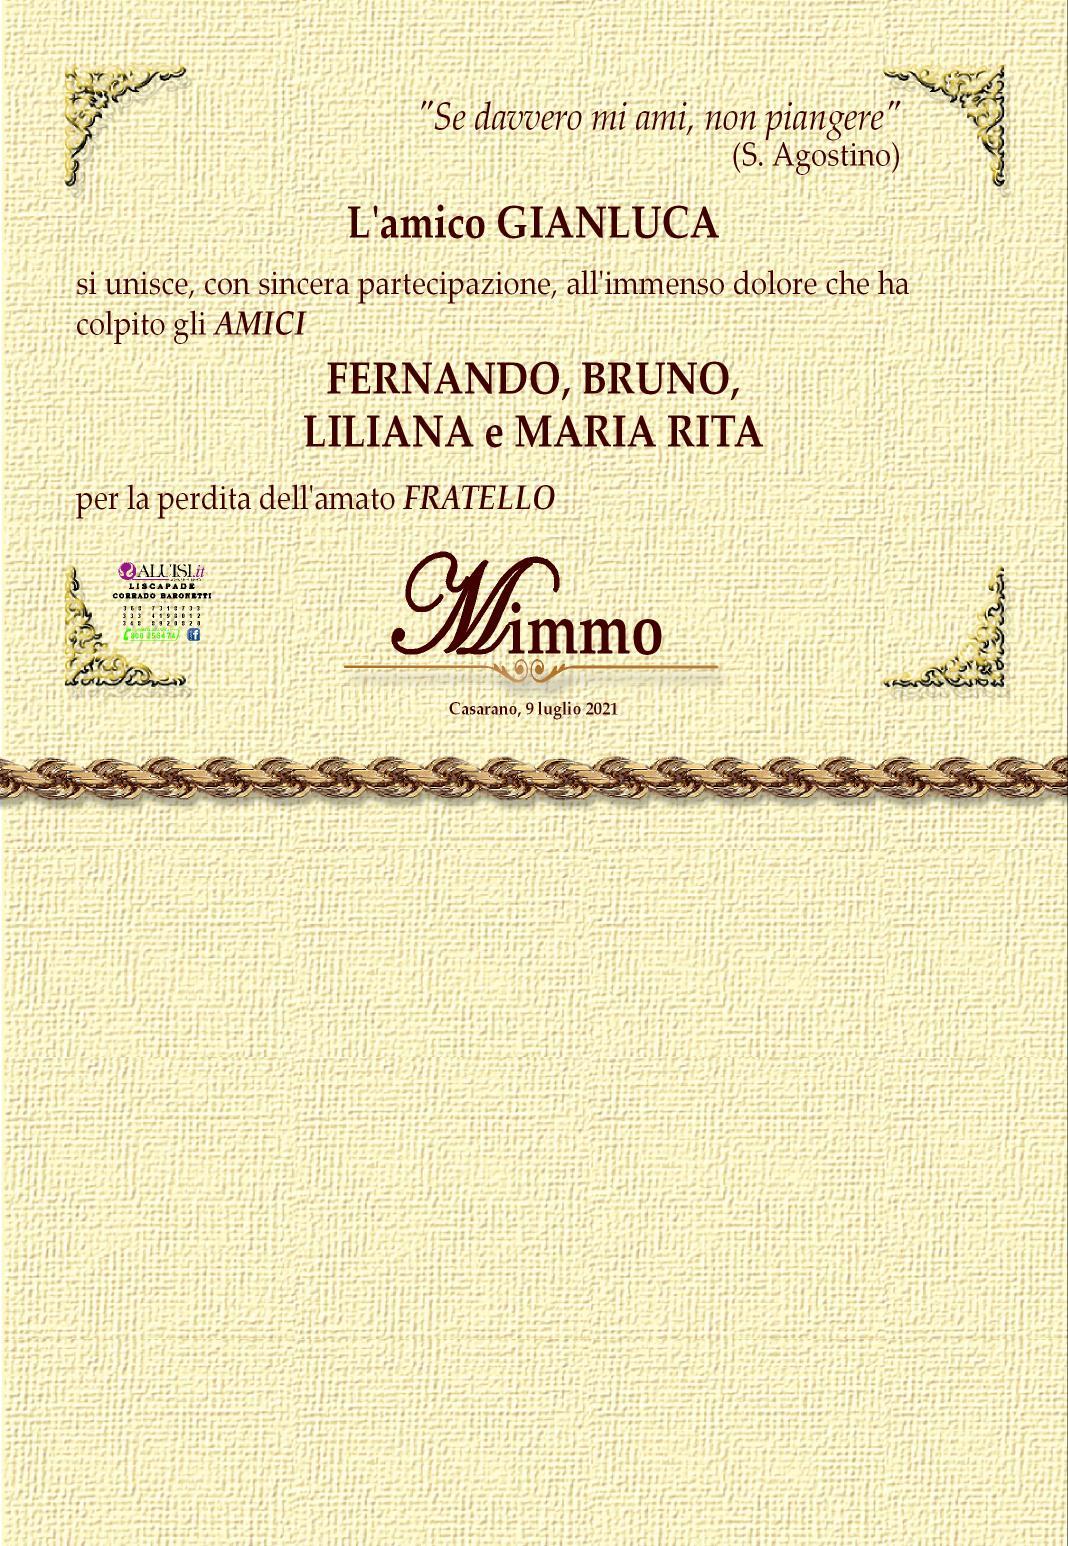 PARTECIPAIZONE-COSIMO-SALVATORE-MAMELI-CASARANO-2-1.jpg